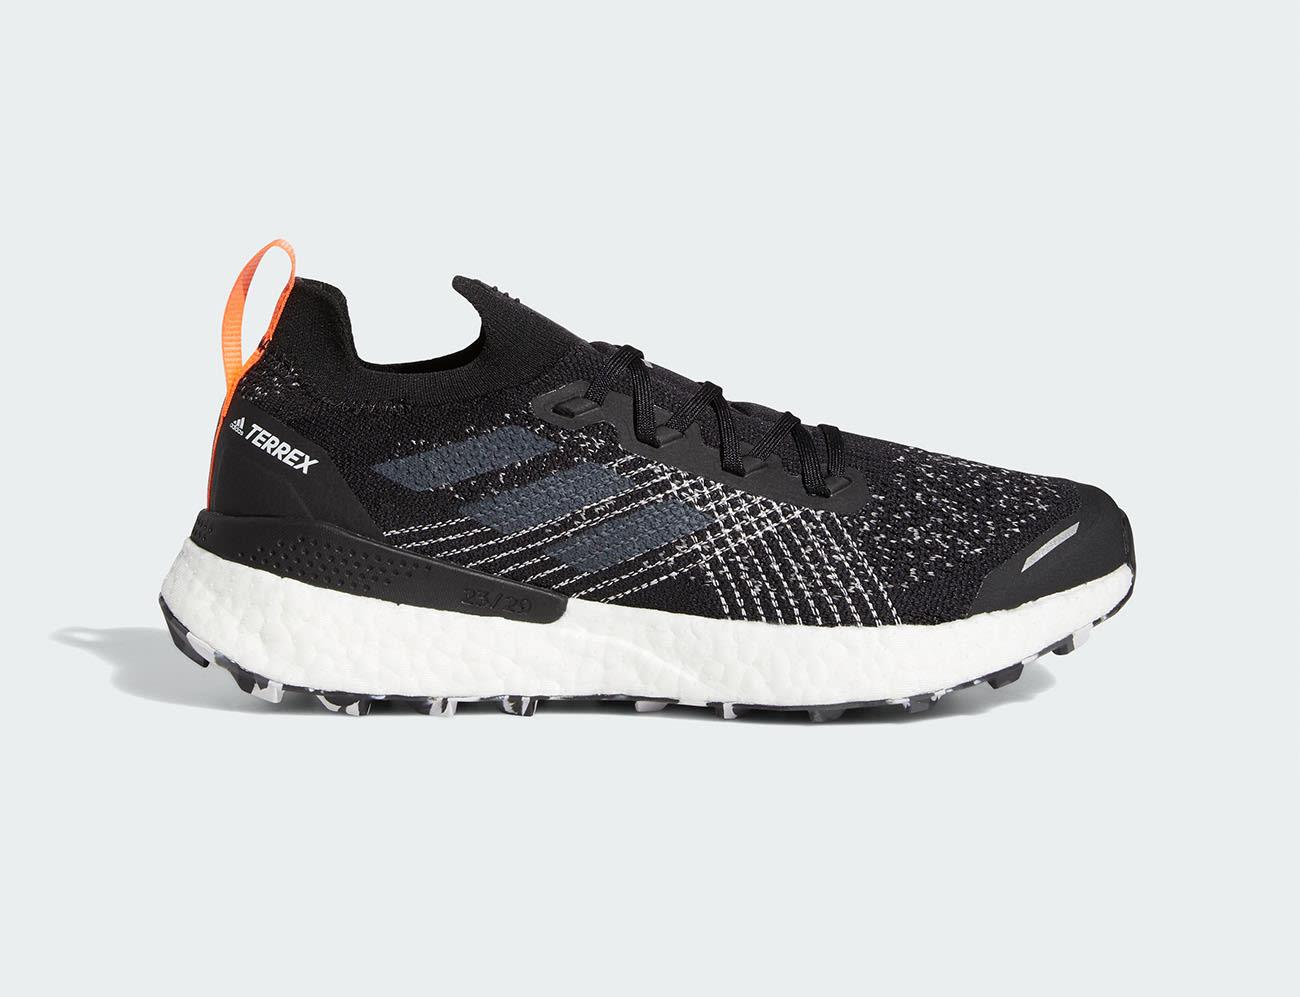 on running shoe finder